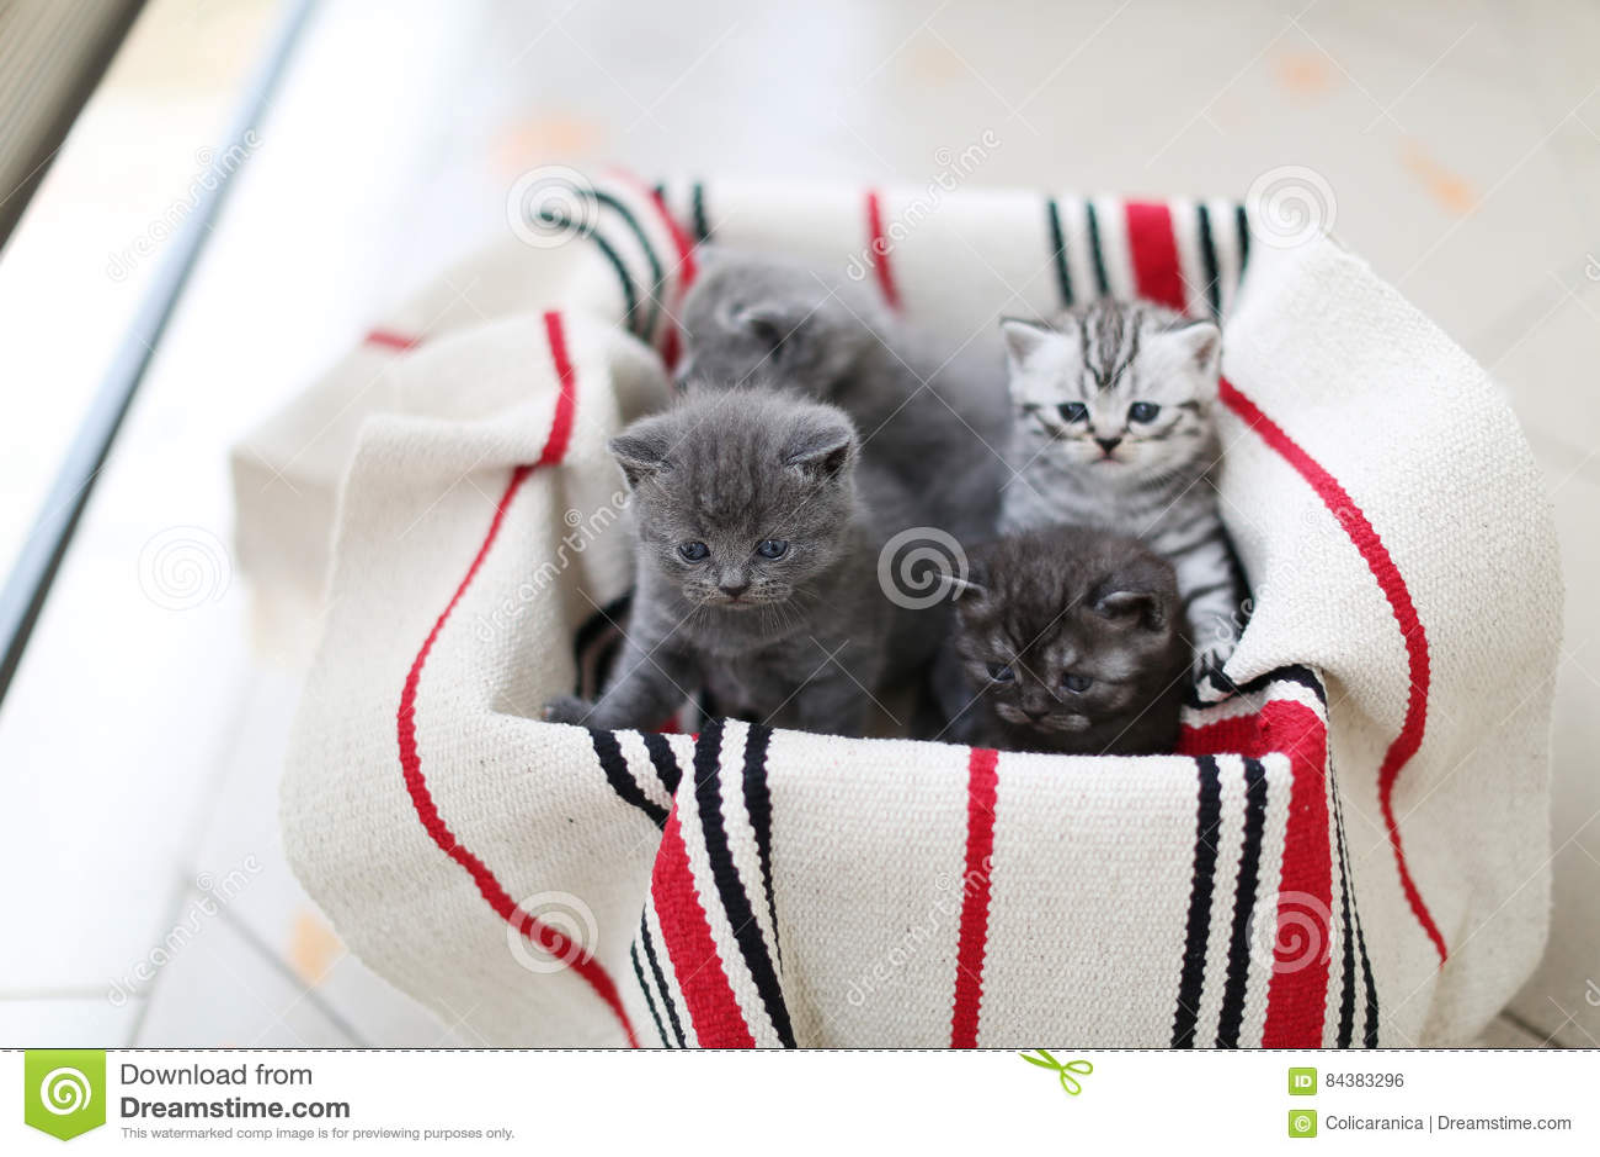 Cute face, newly born kittens